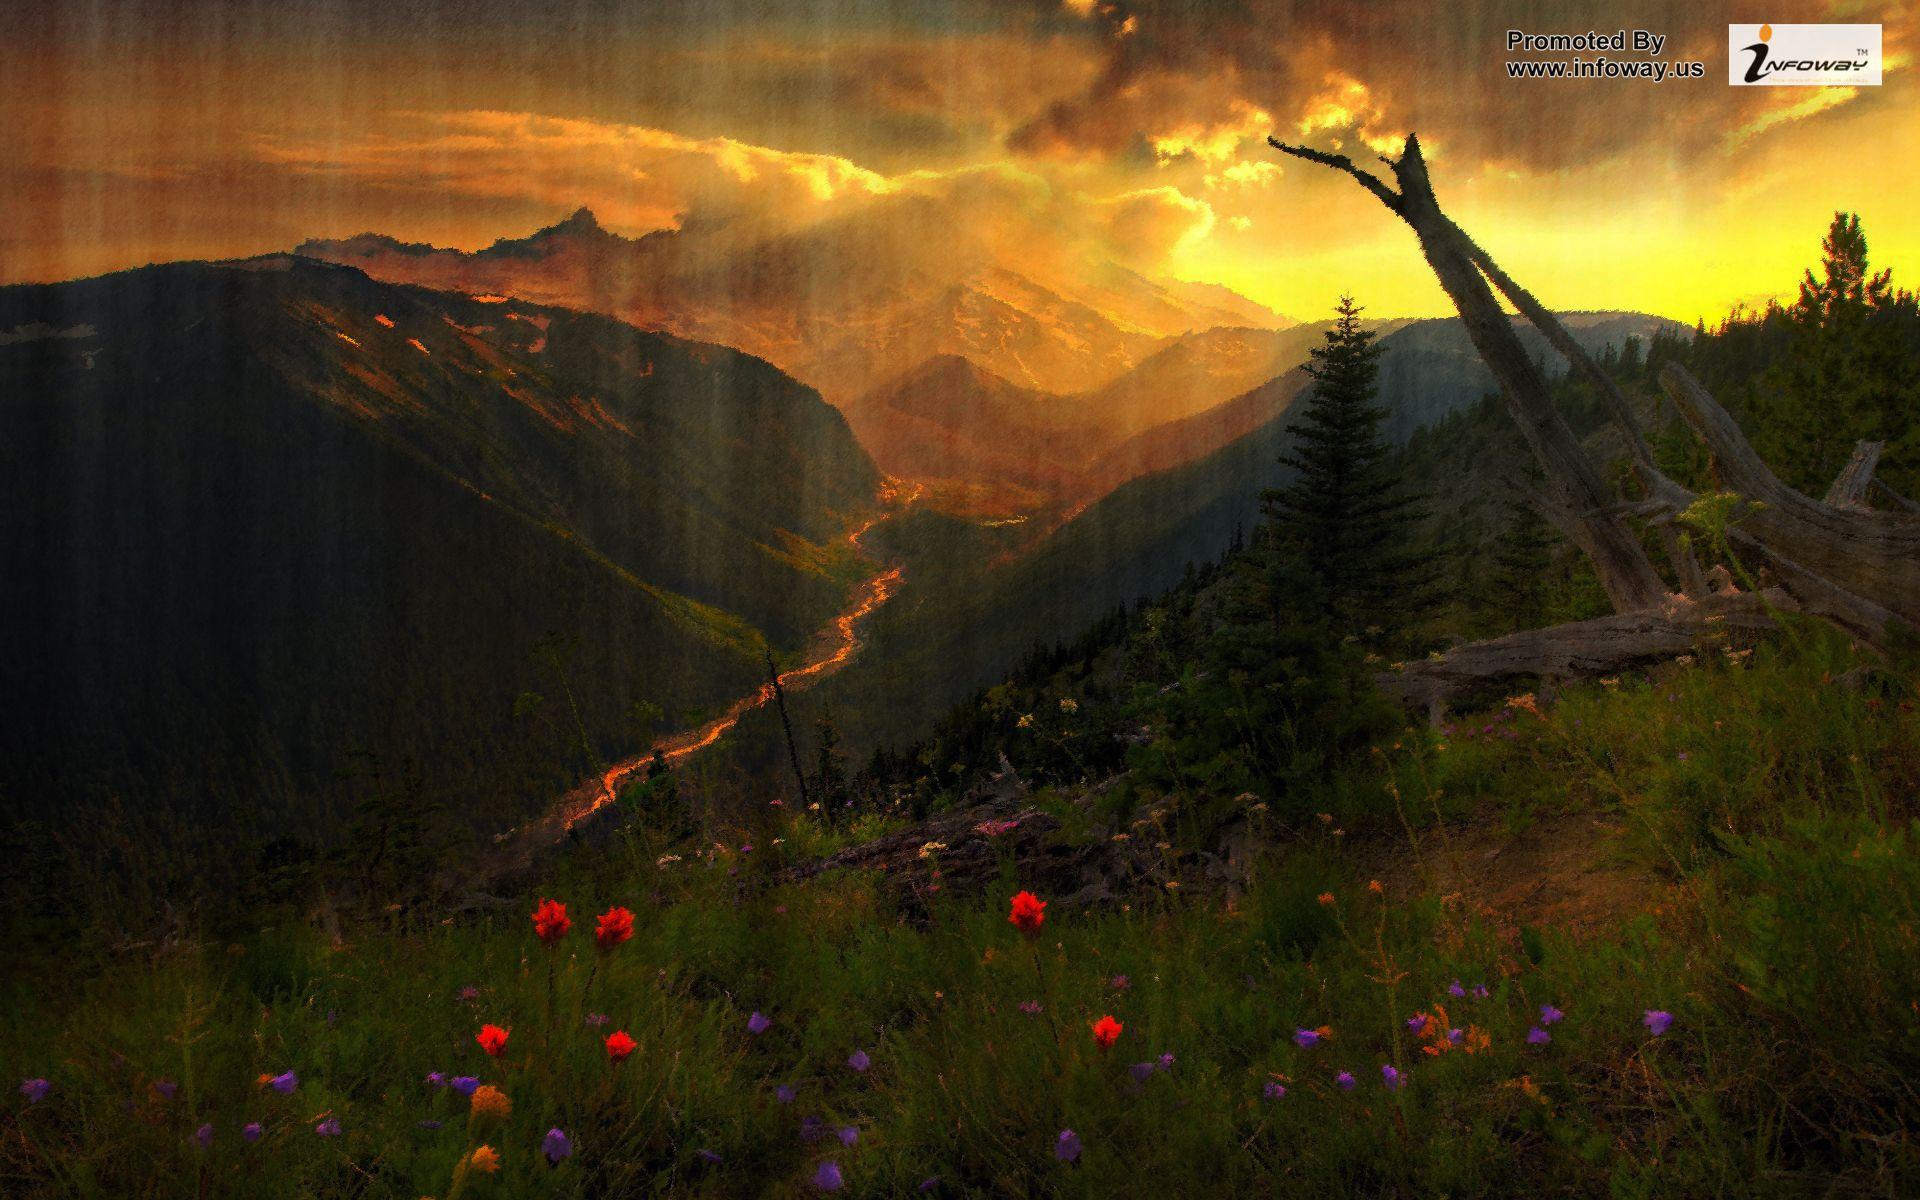 beautiful nature scenery   Photo 305 of 342 phombocom 1920x1200